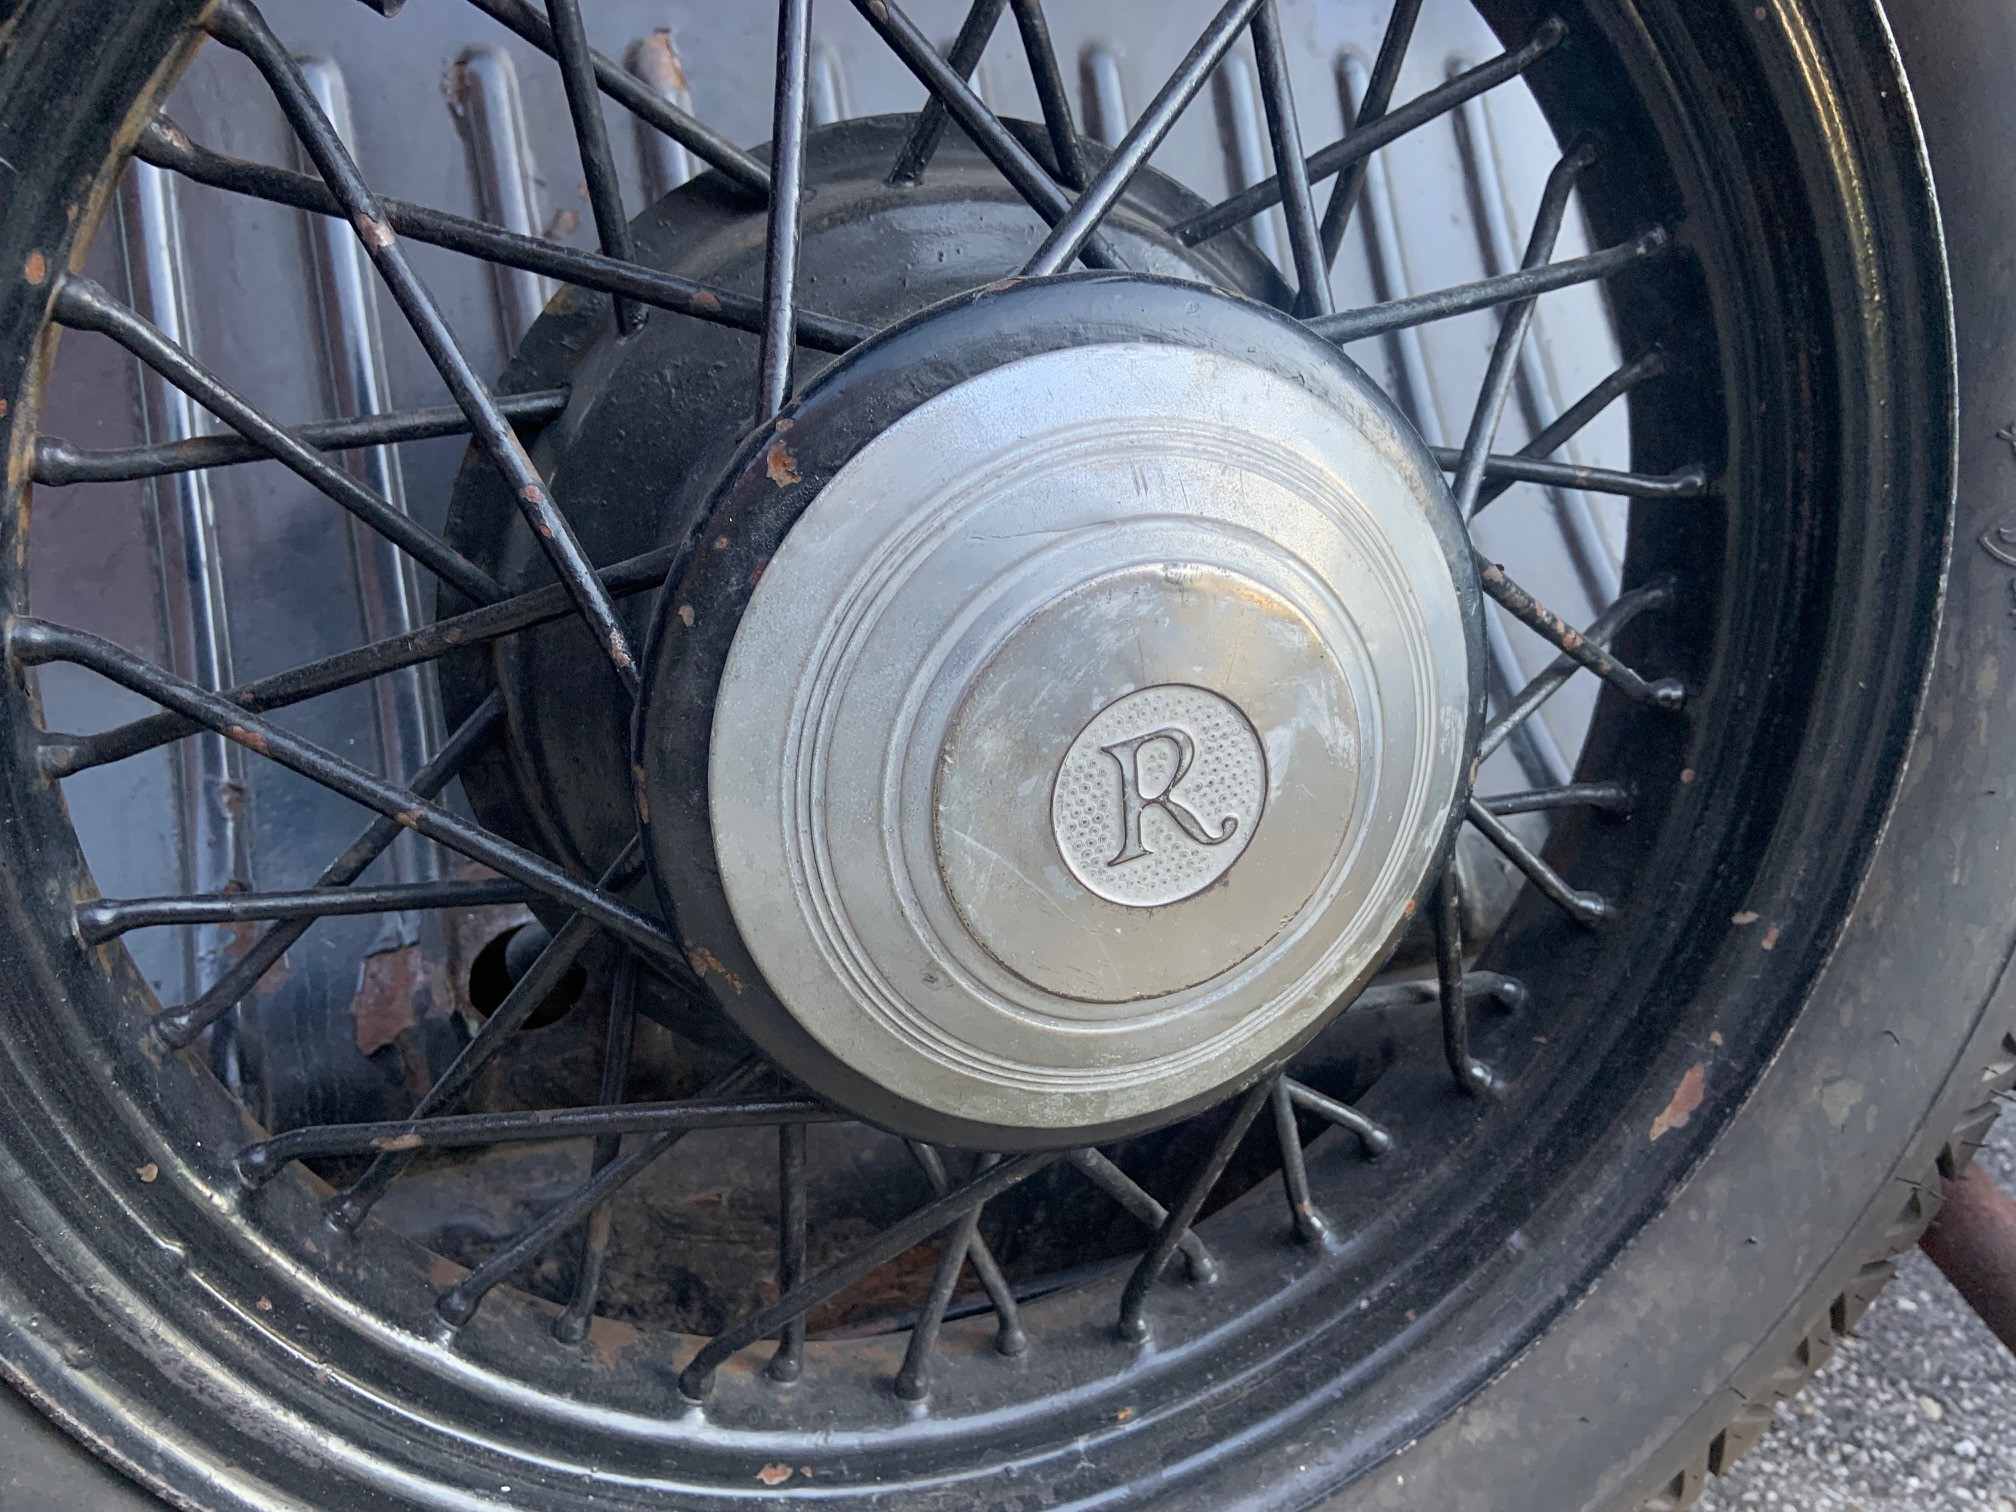 1932 Rockne - close-up wheel